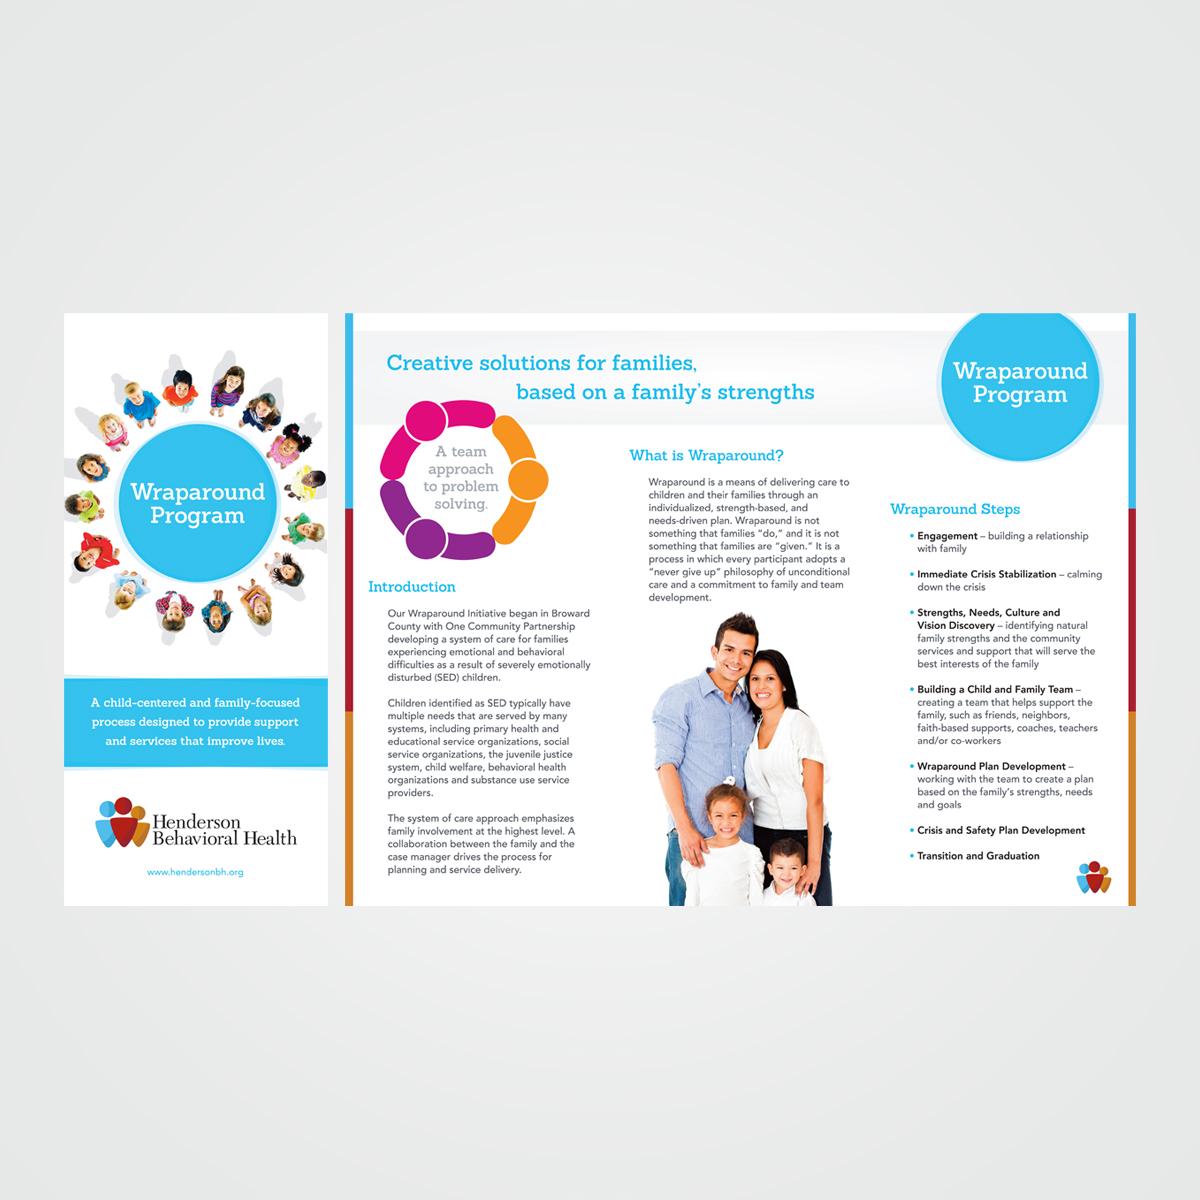 Program brochure design for Henderson Behavioral Health - one of a complete series of program brochures